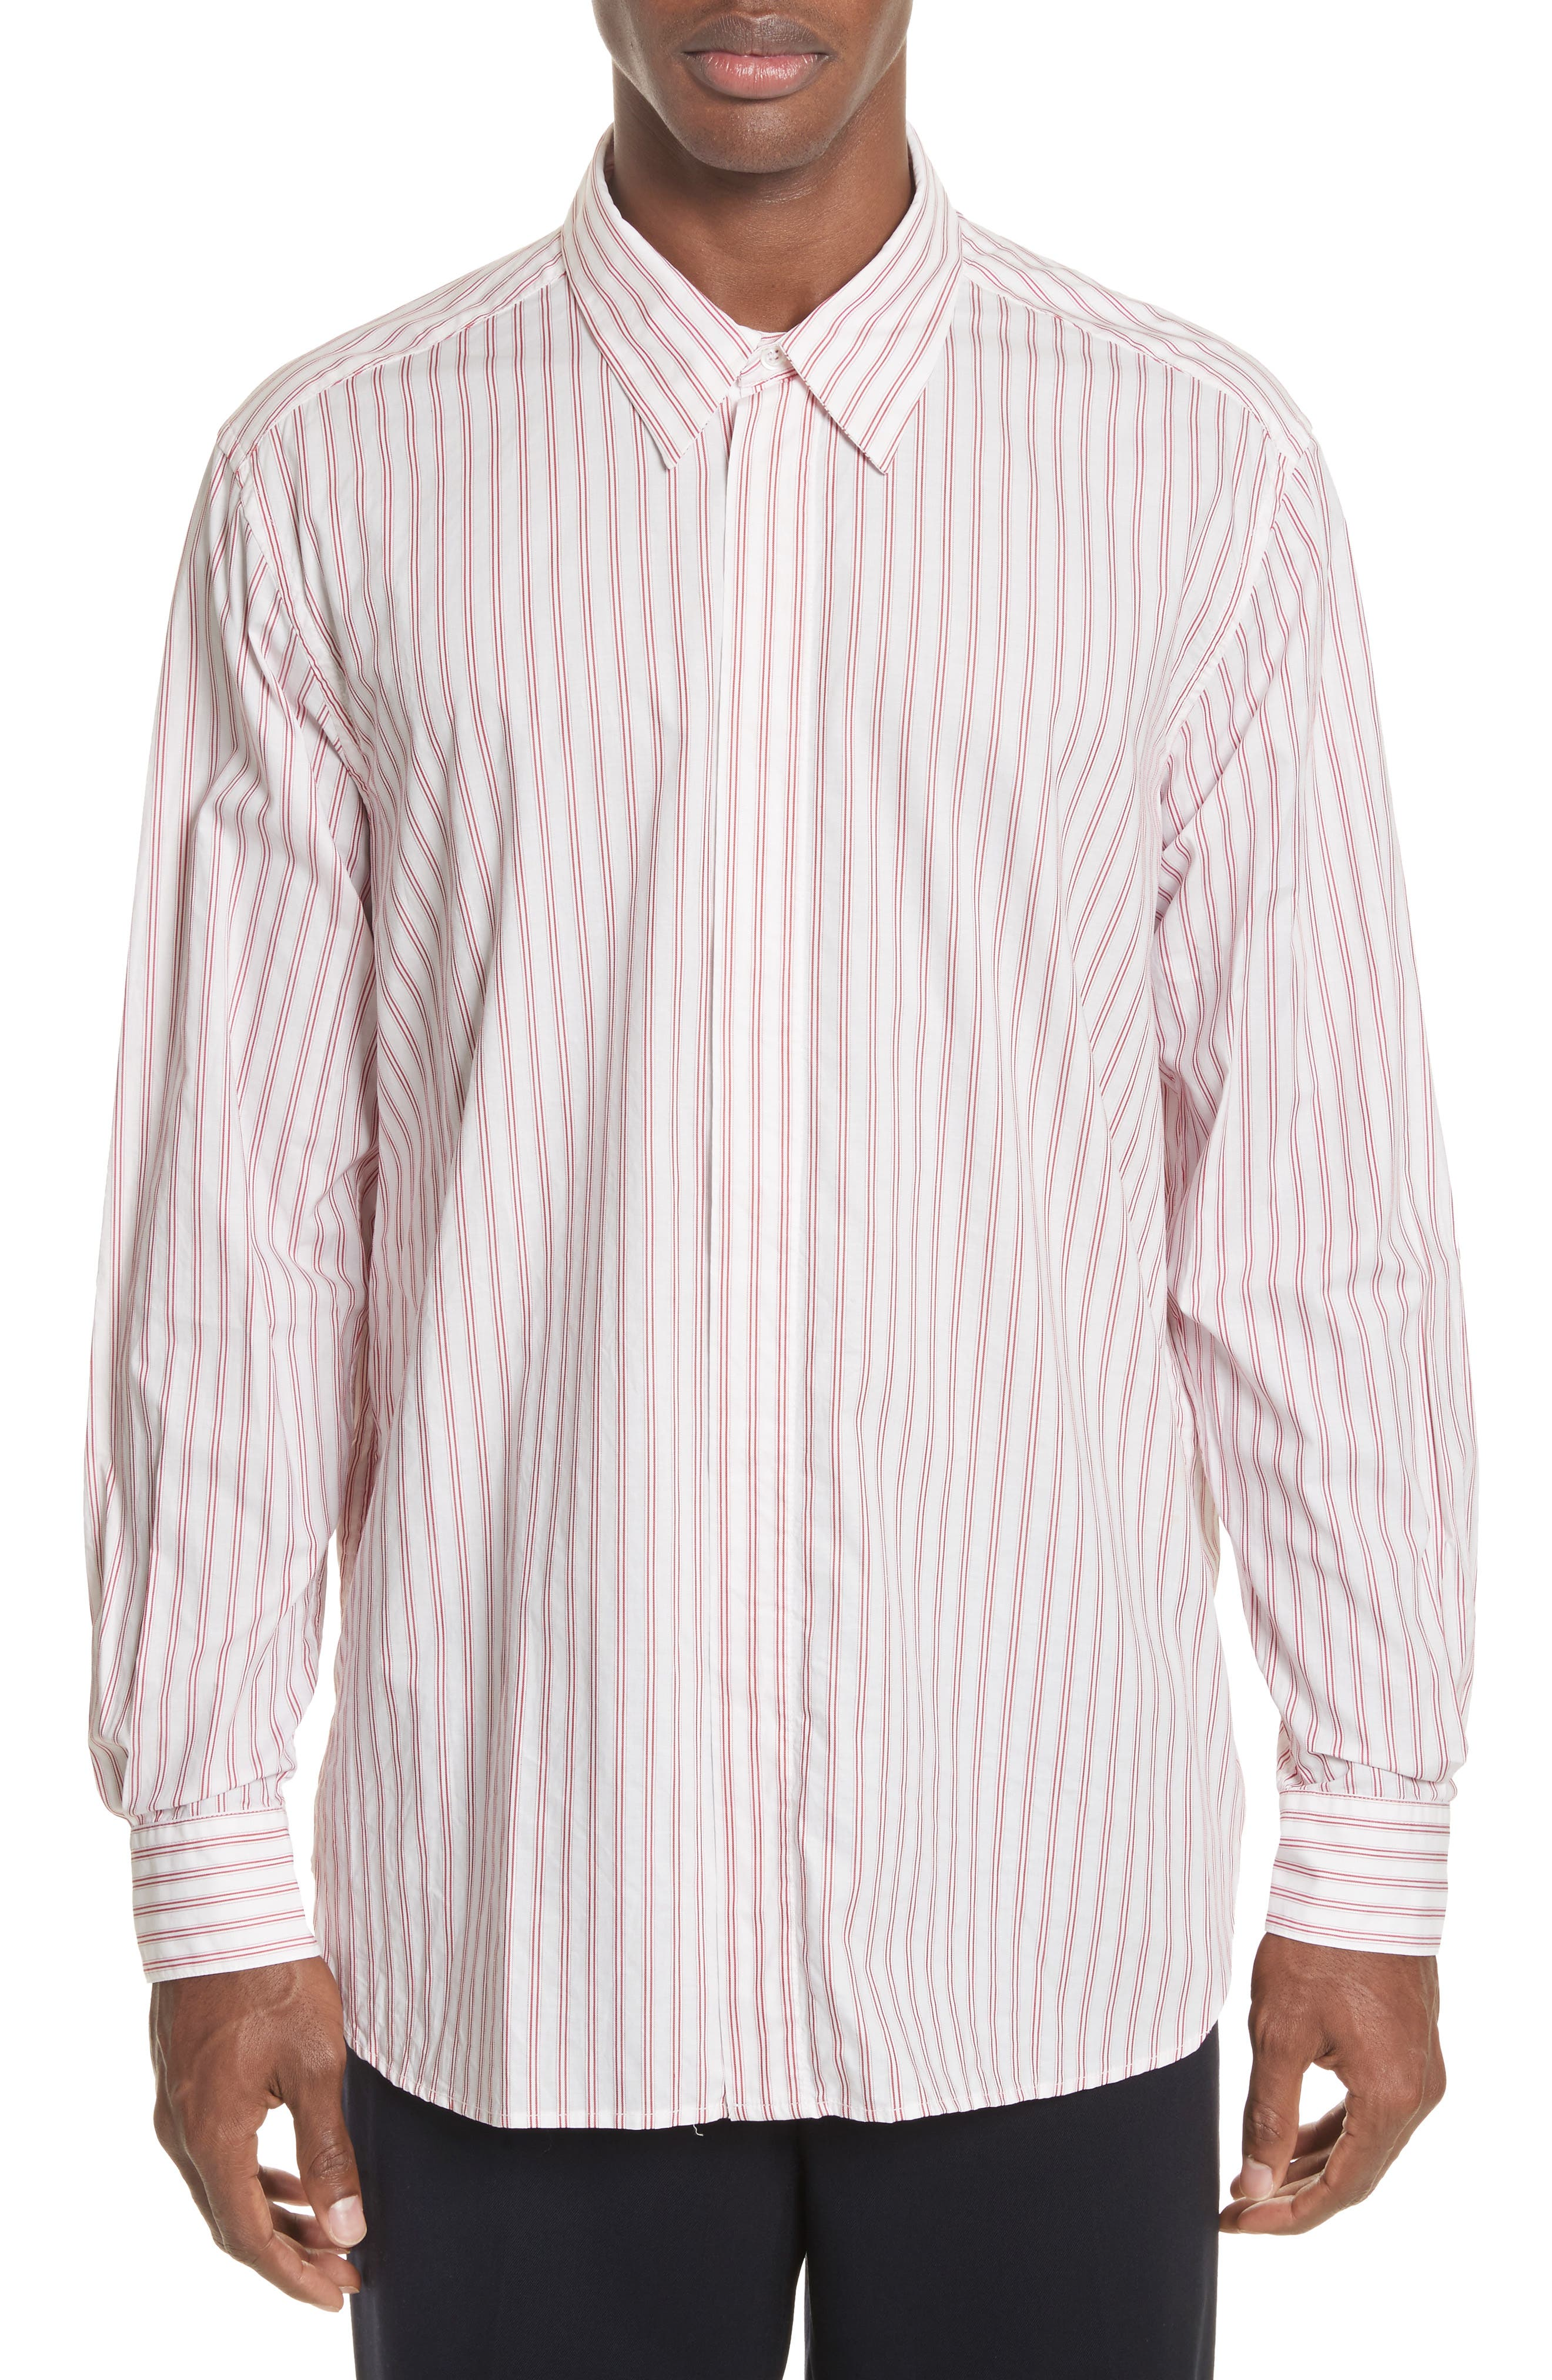 Aega Striped Sport Shirt,                         Main,                         color, Unico